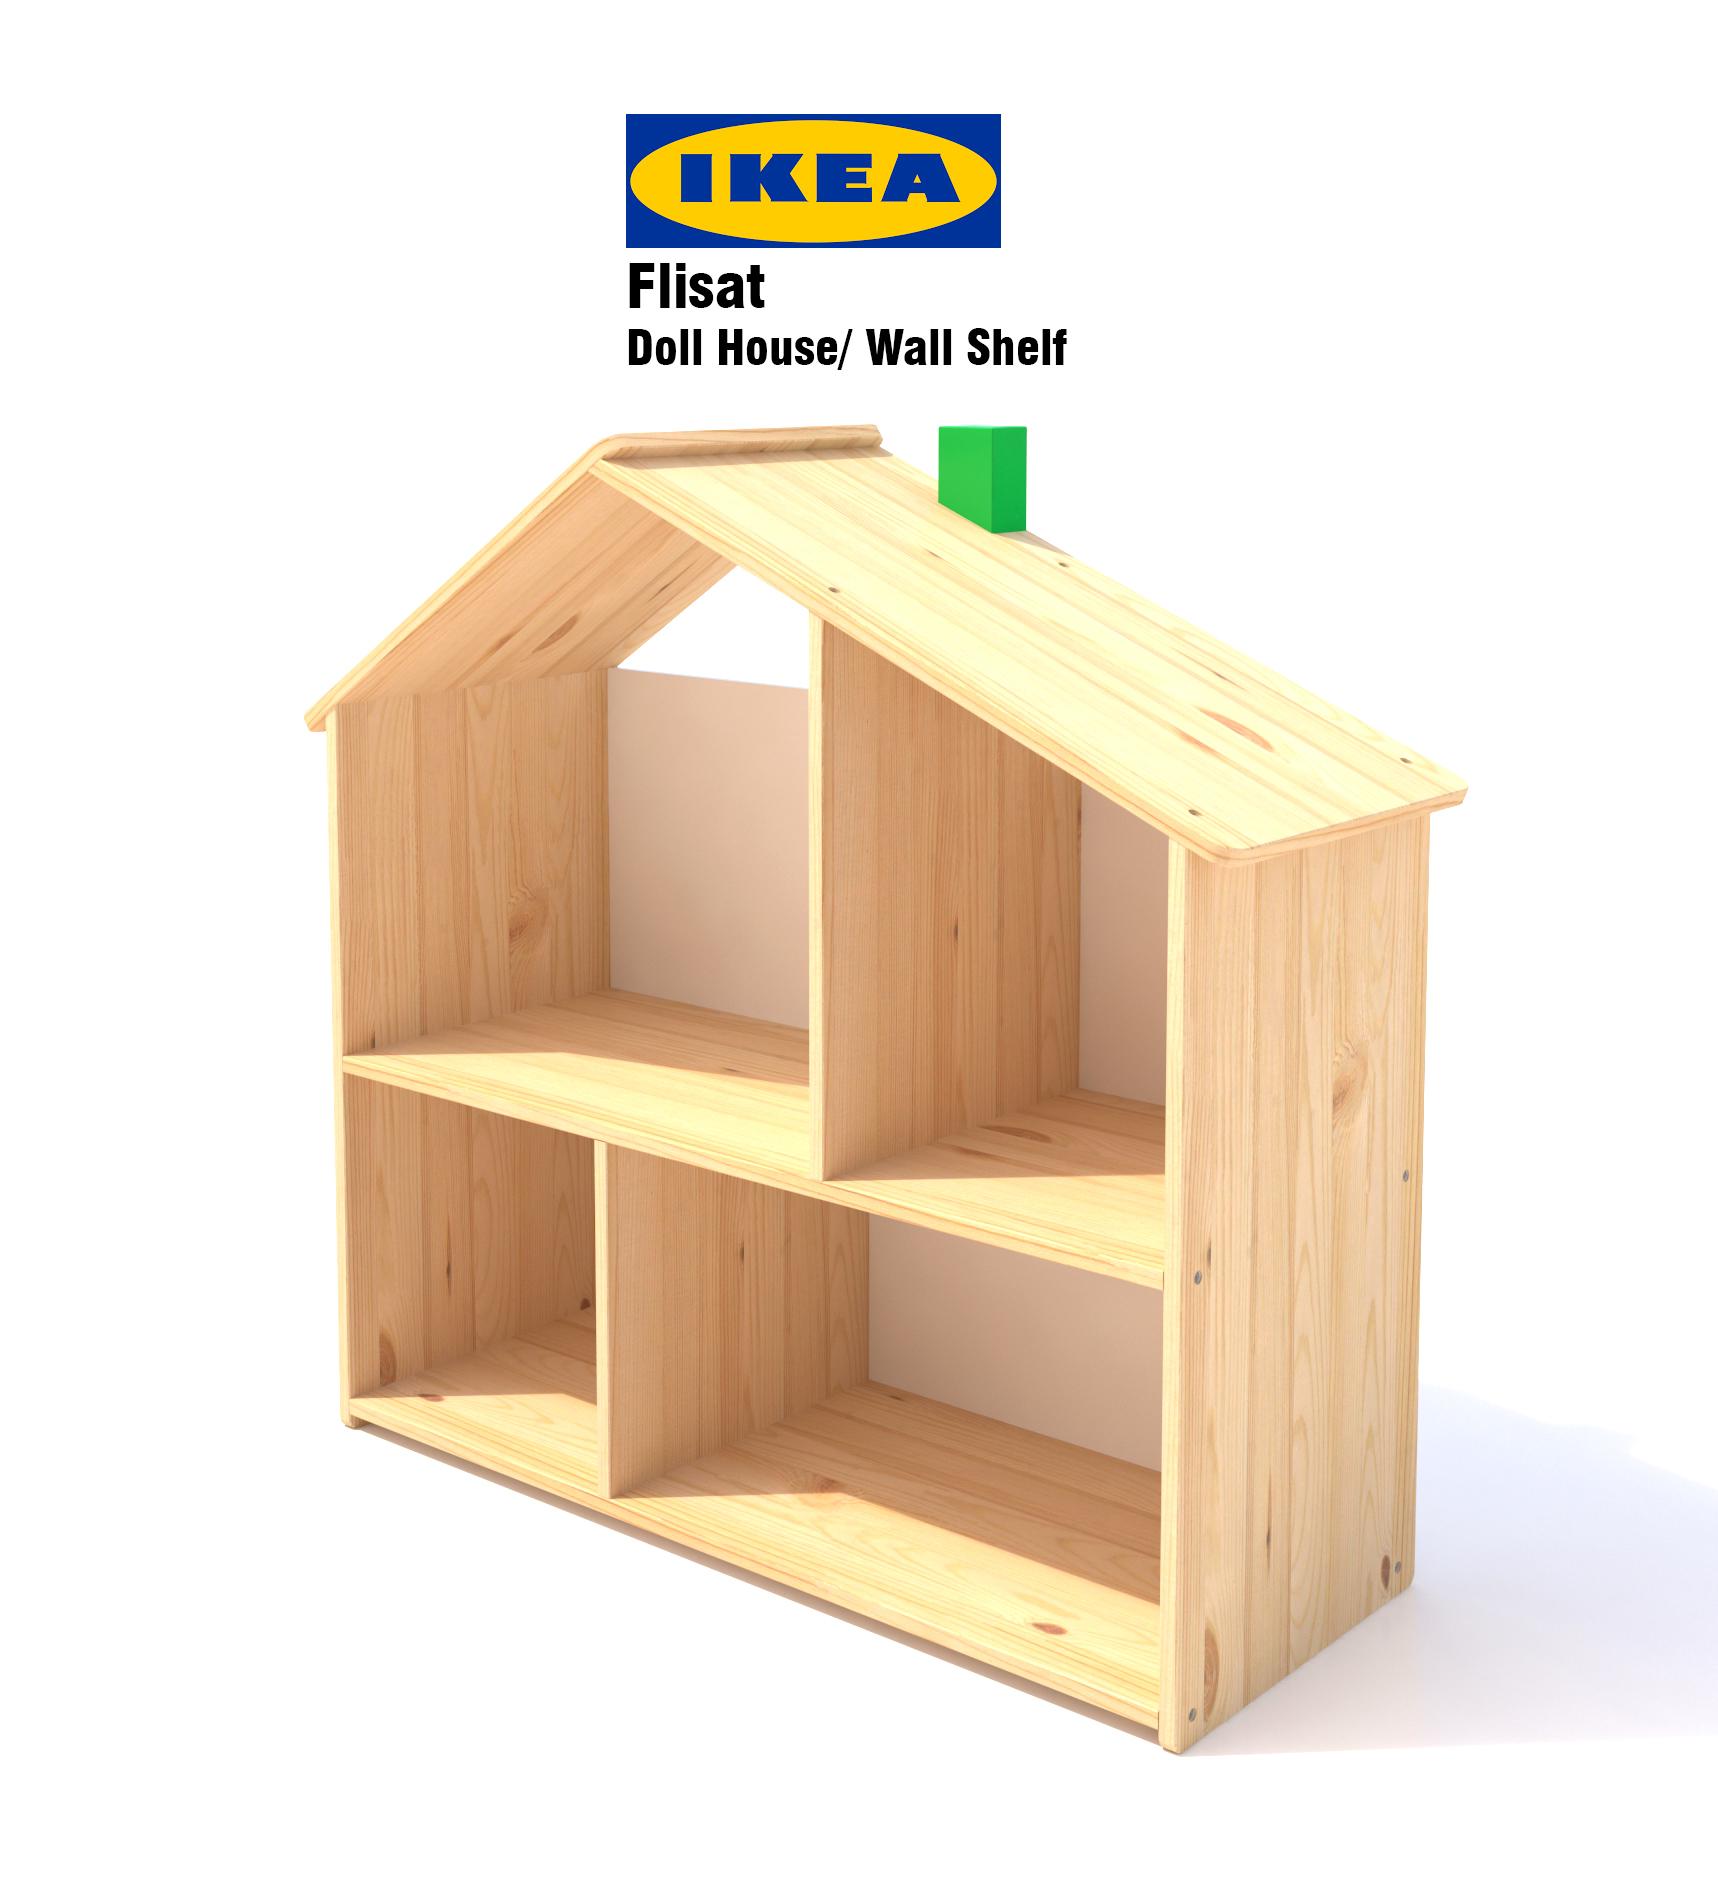 Ikea Flisat Doll House Shelf